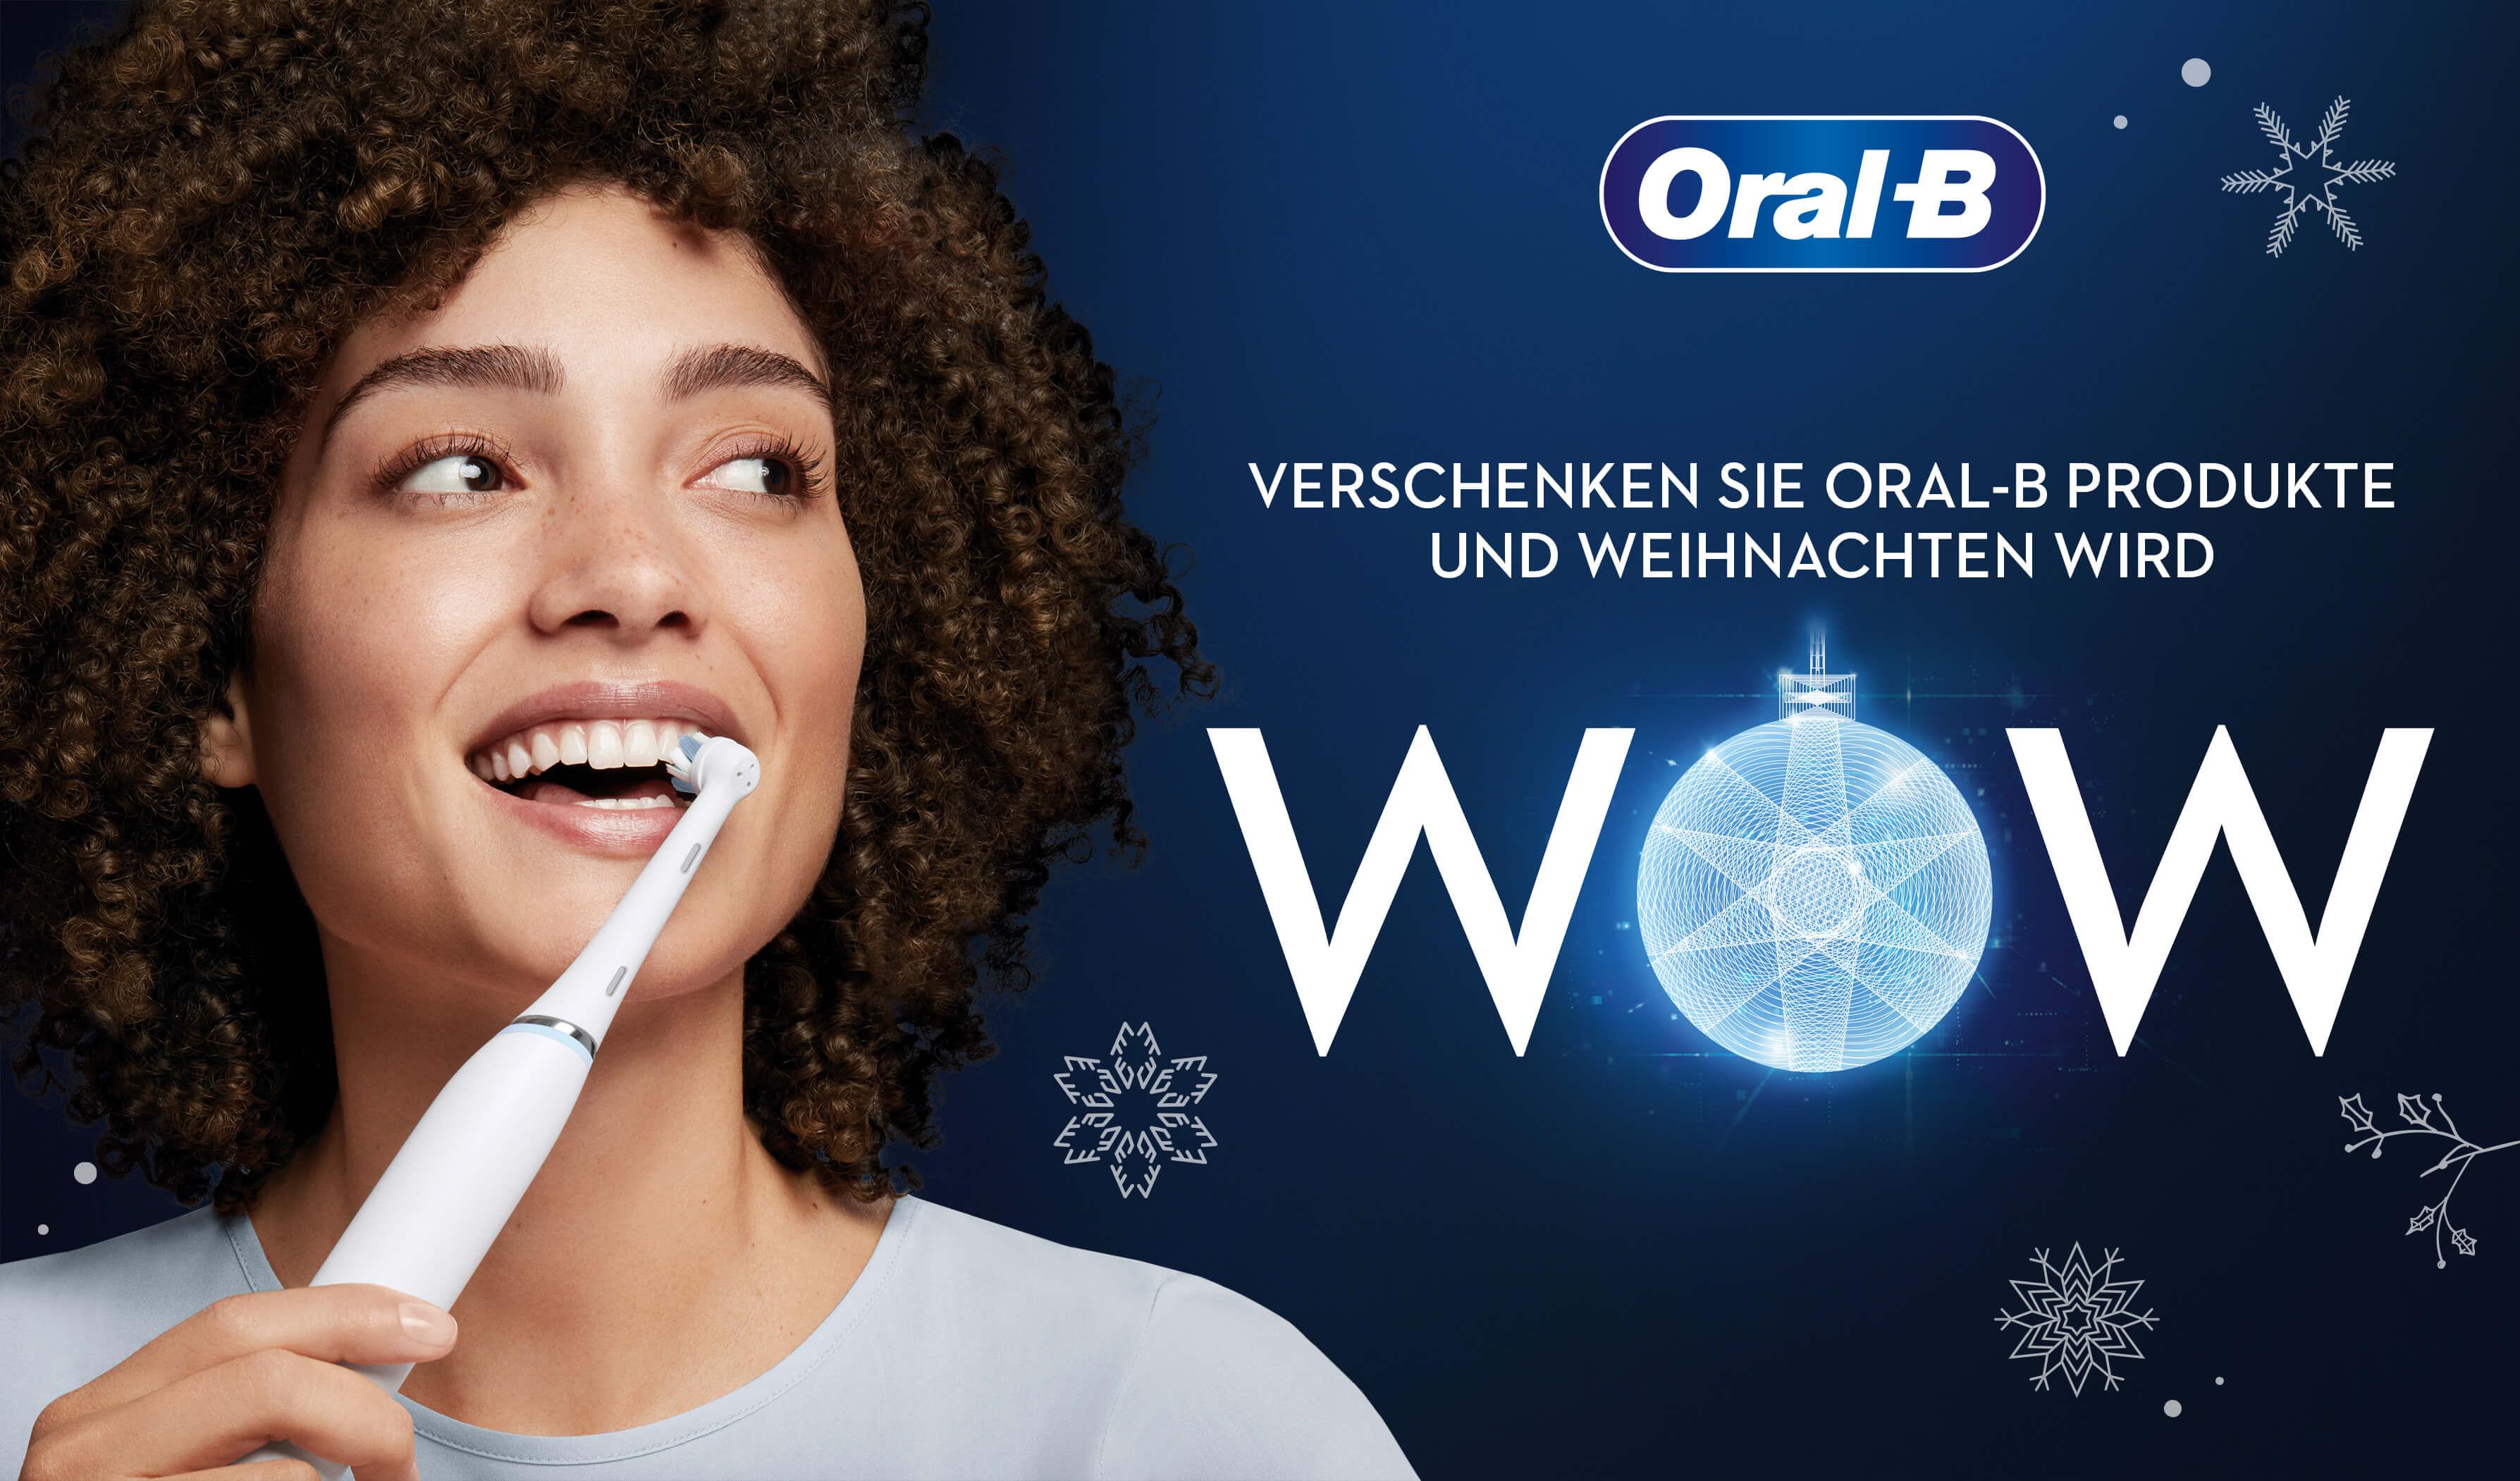 "ORAL-B CASHBACK-AKTION ""X-MAS 2020"" – Bis zu 40 Euro Cashback"